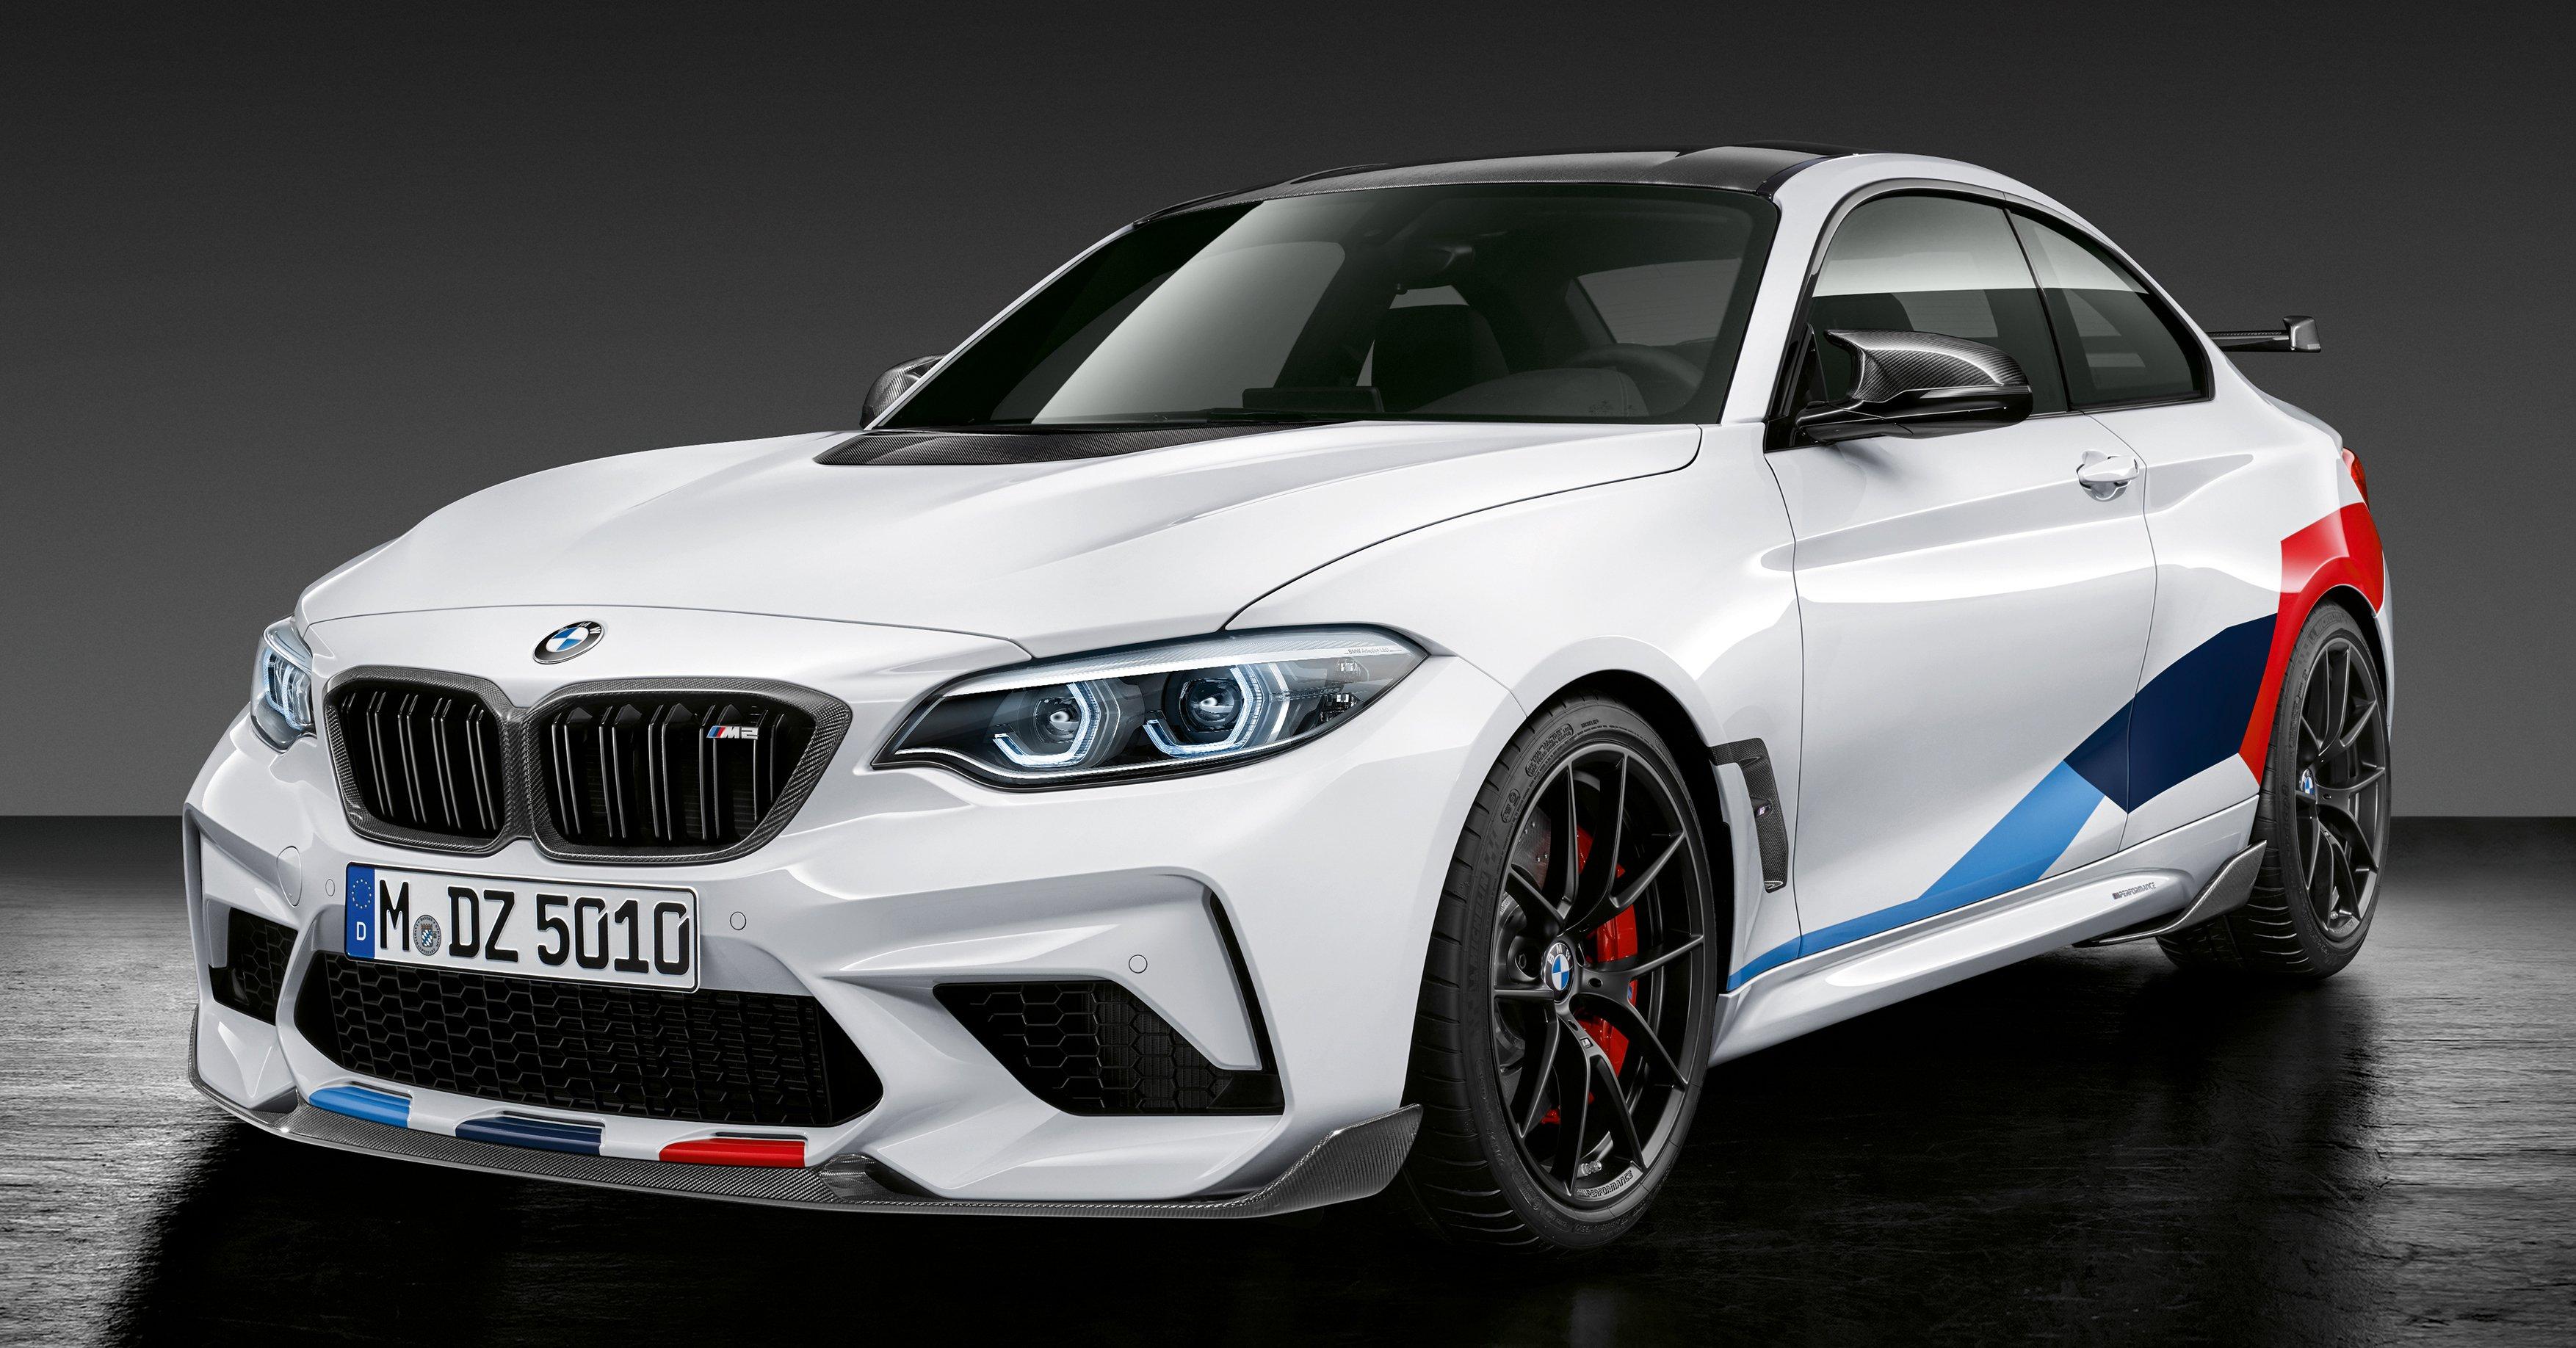 Bmw >> BMW M2 Competition receives M Performance Parts Paul Tan - Image 815476